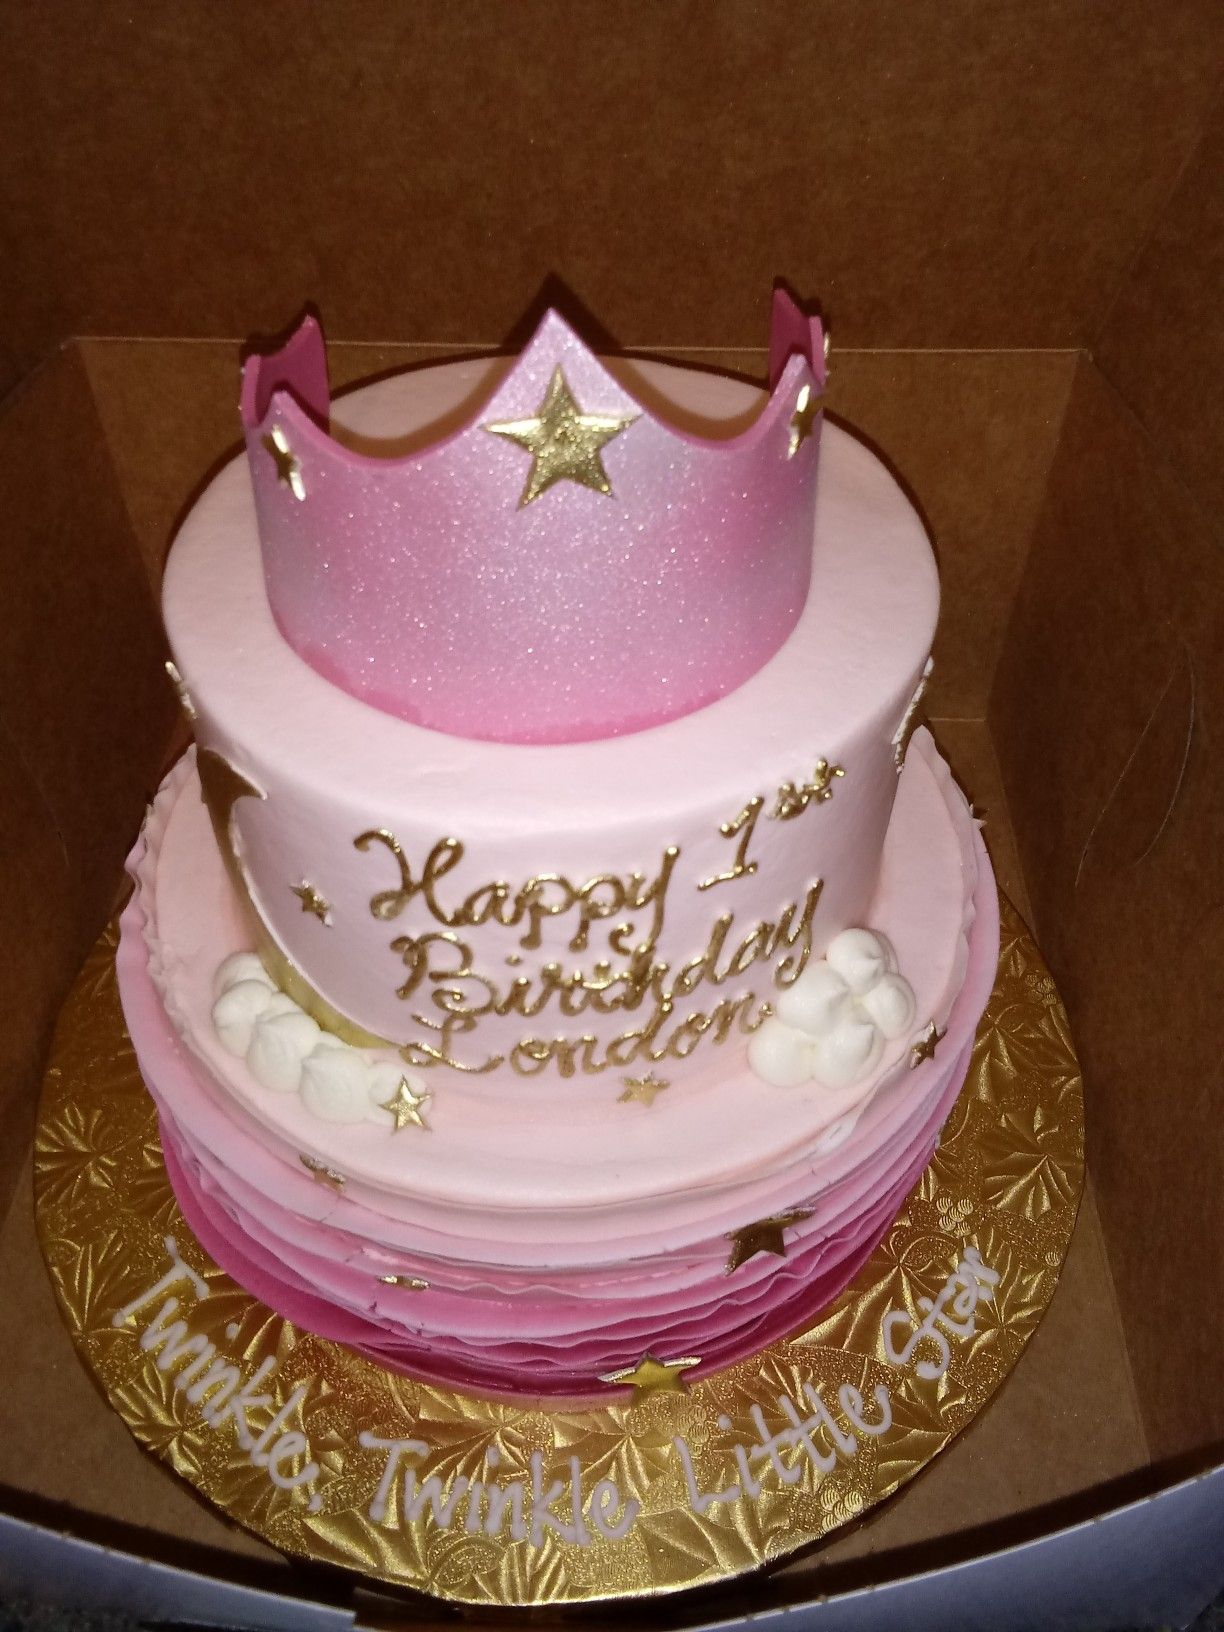 Marvelous Ms London Star Birthday Cake 1Yrs Old Cake Birthday Cake Personalised Birthday Cards Paralily Jamesorg